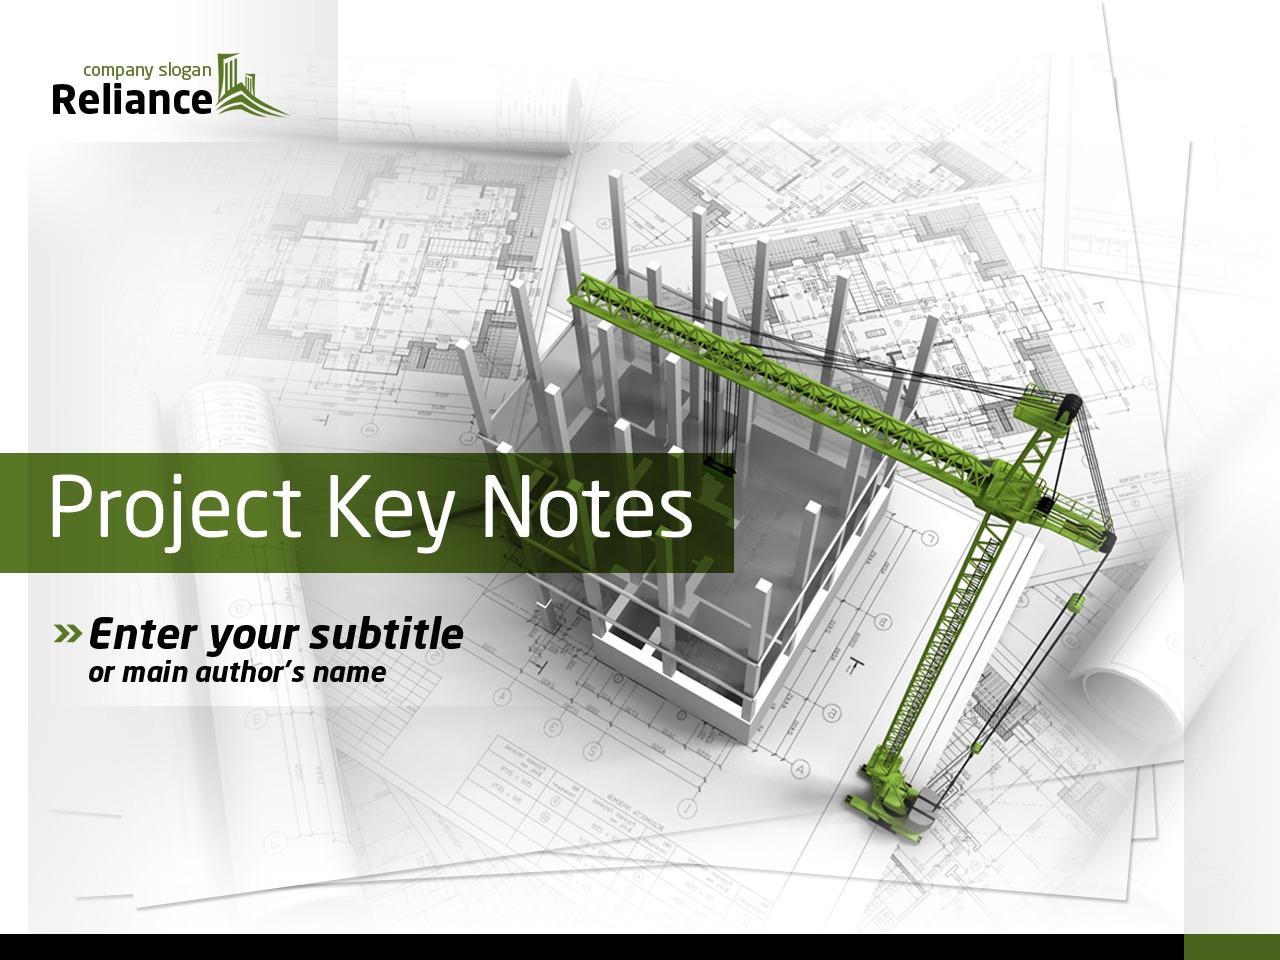 Plantilla PowerPoint #36736 para Sitio de Empresas de construcción - captura de pantalla